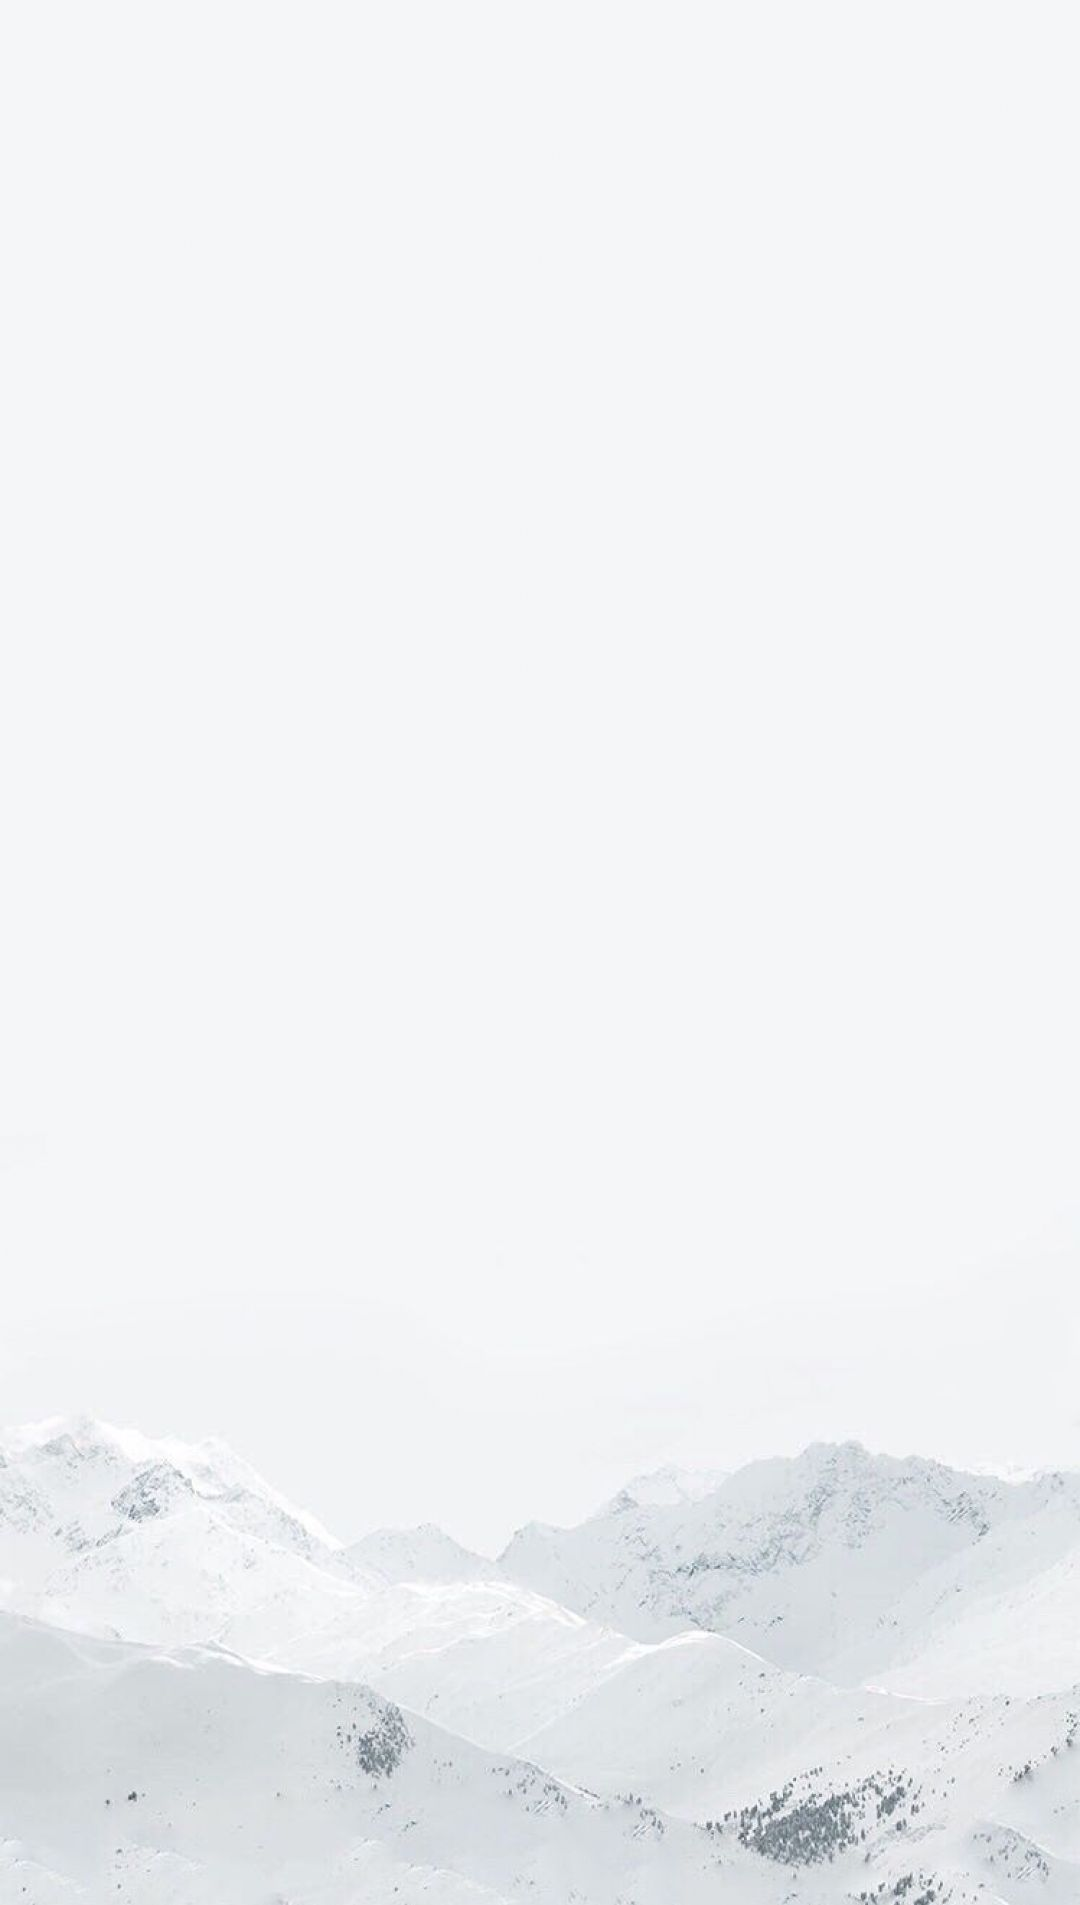 Iphonewallpaper White Hintergrundbildiphone Tapete Winter Android Iphone Desktop Hd Ba In 2020 Iphone Wallpaper Winter White Wallpaper For Iphone White Wallpaper